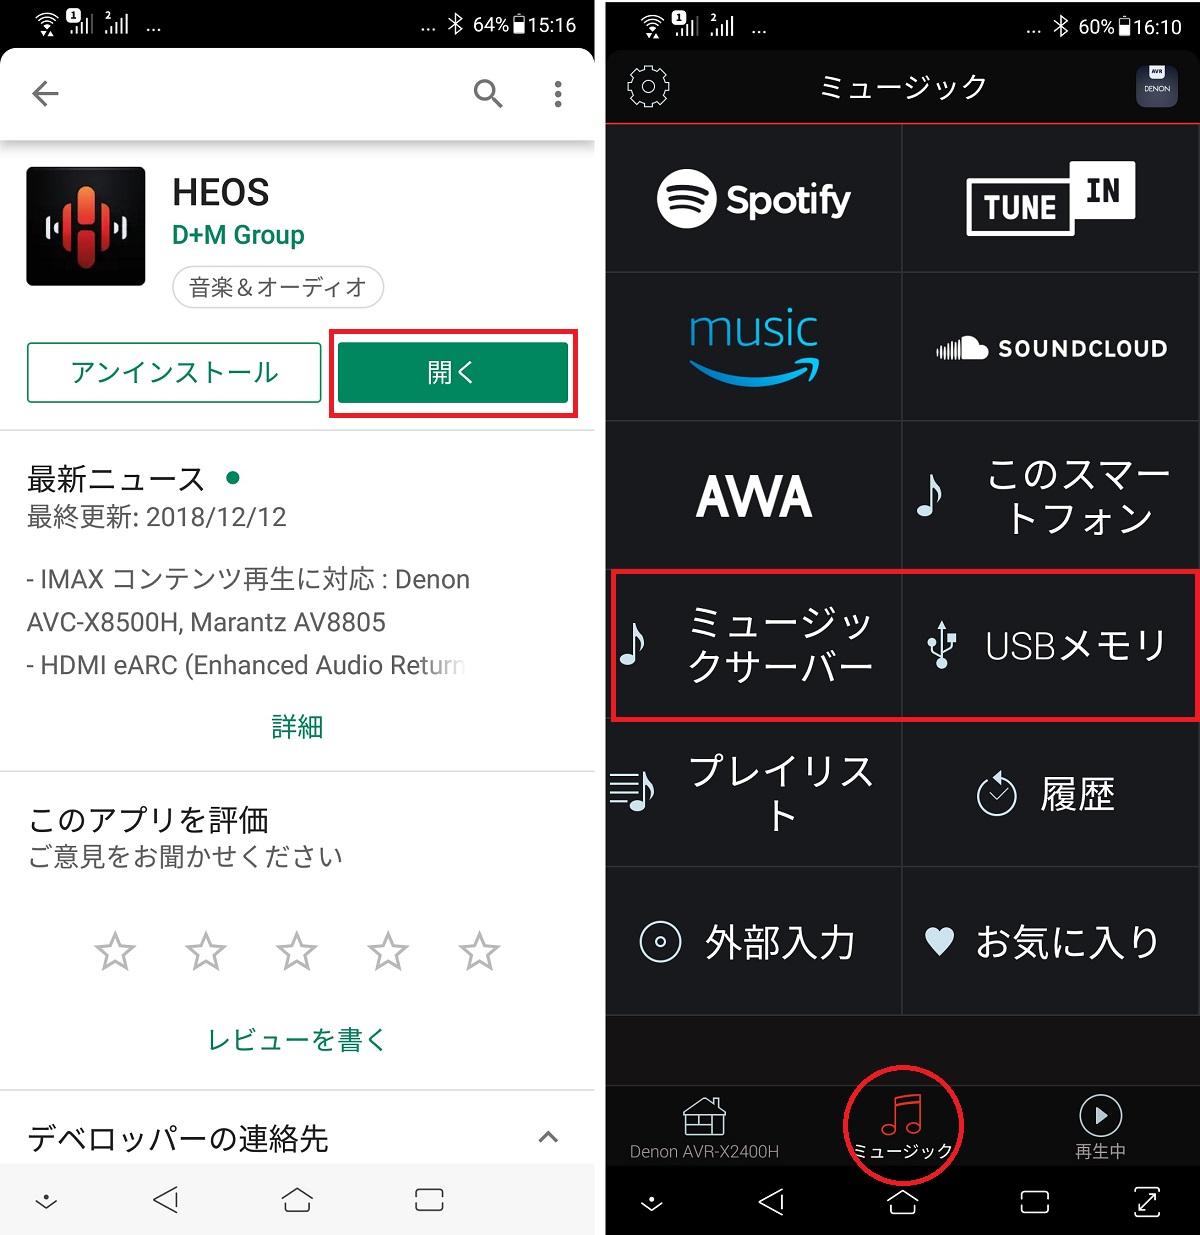 HEOSアプリのインストール